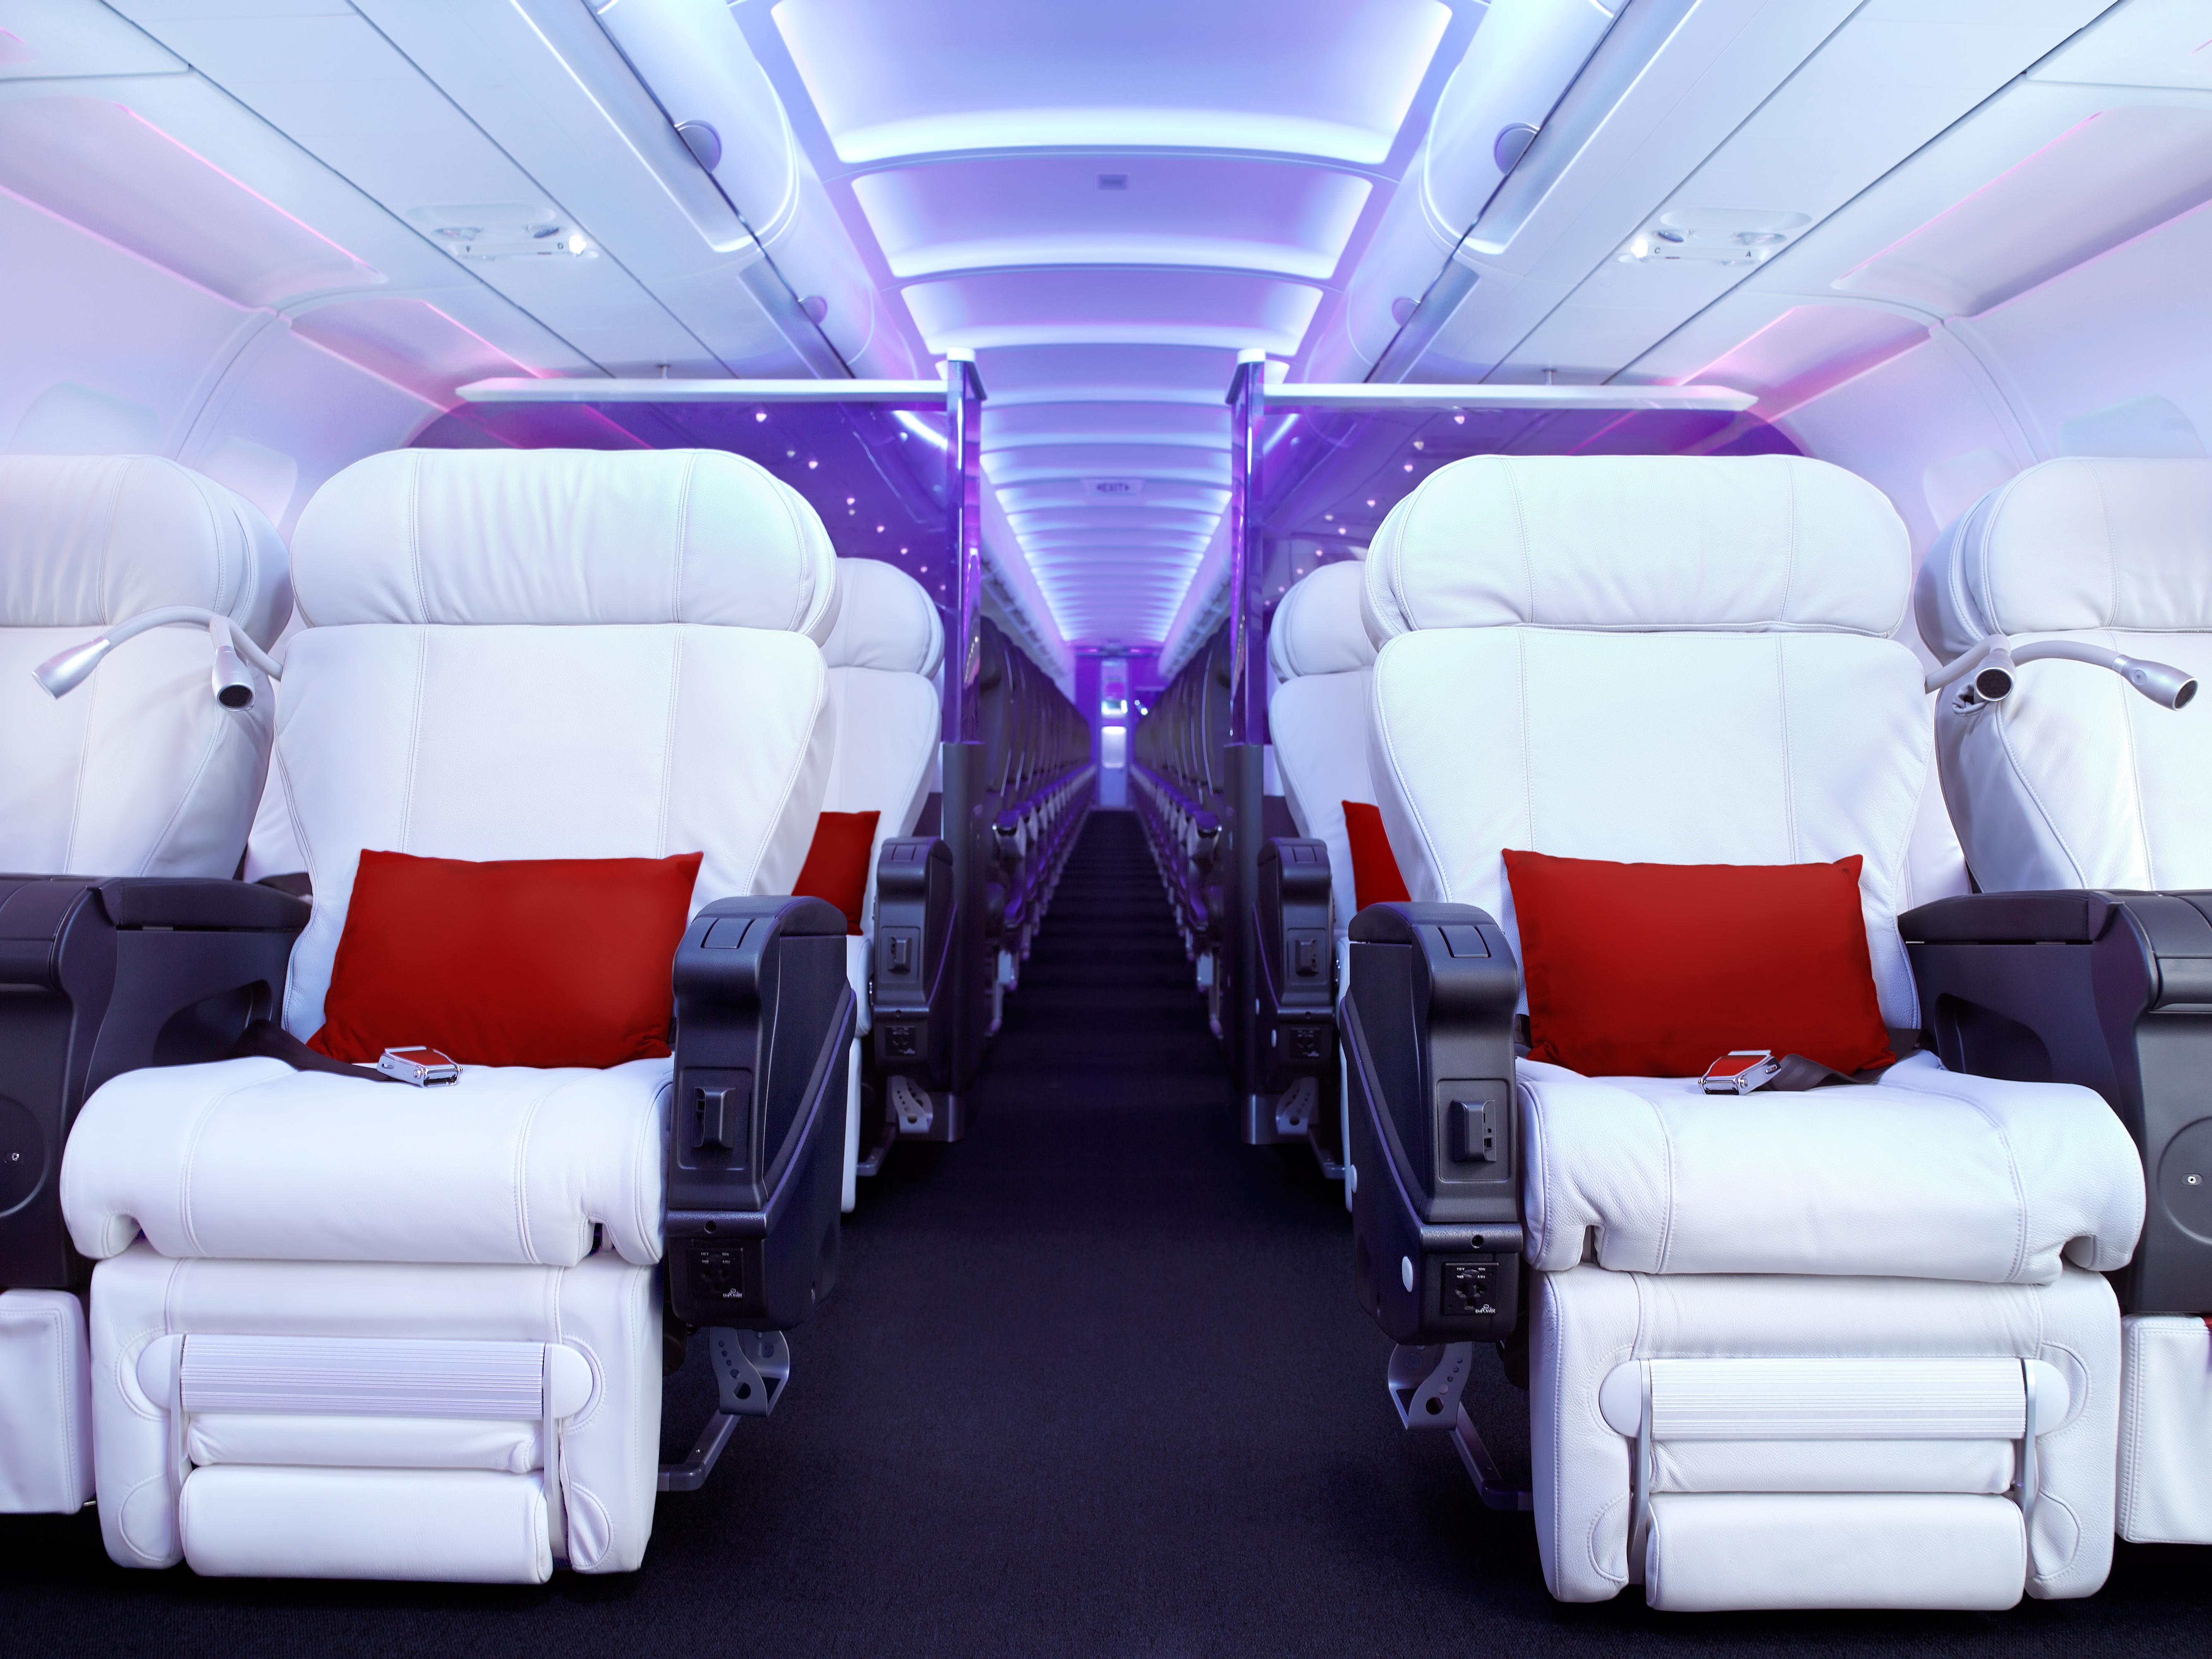 Pic my etihad pearl business class seat 9h on b777 300er may 2012 - Virginamericafirstclass